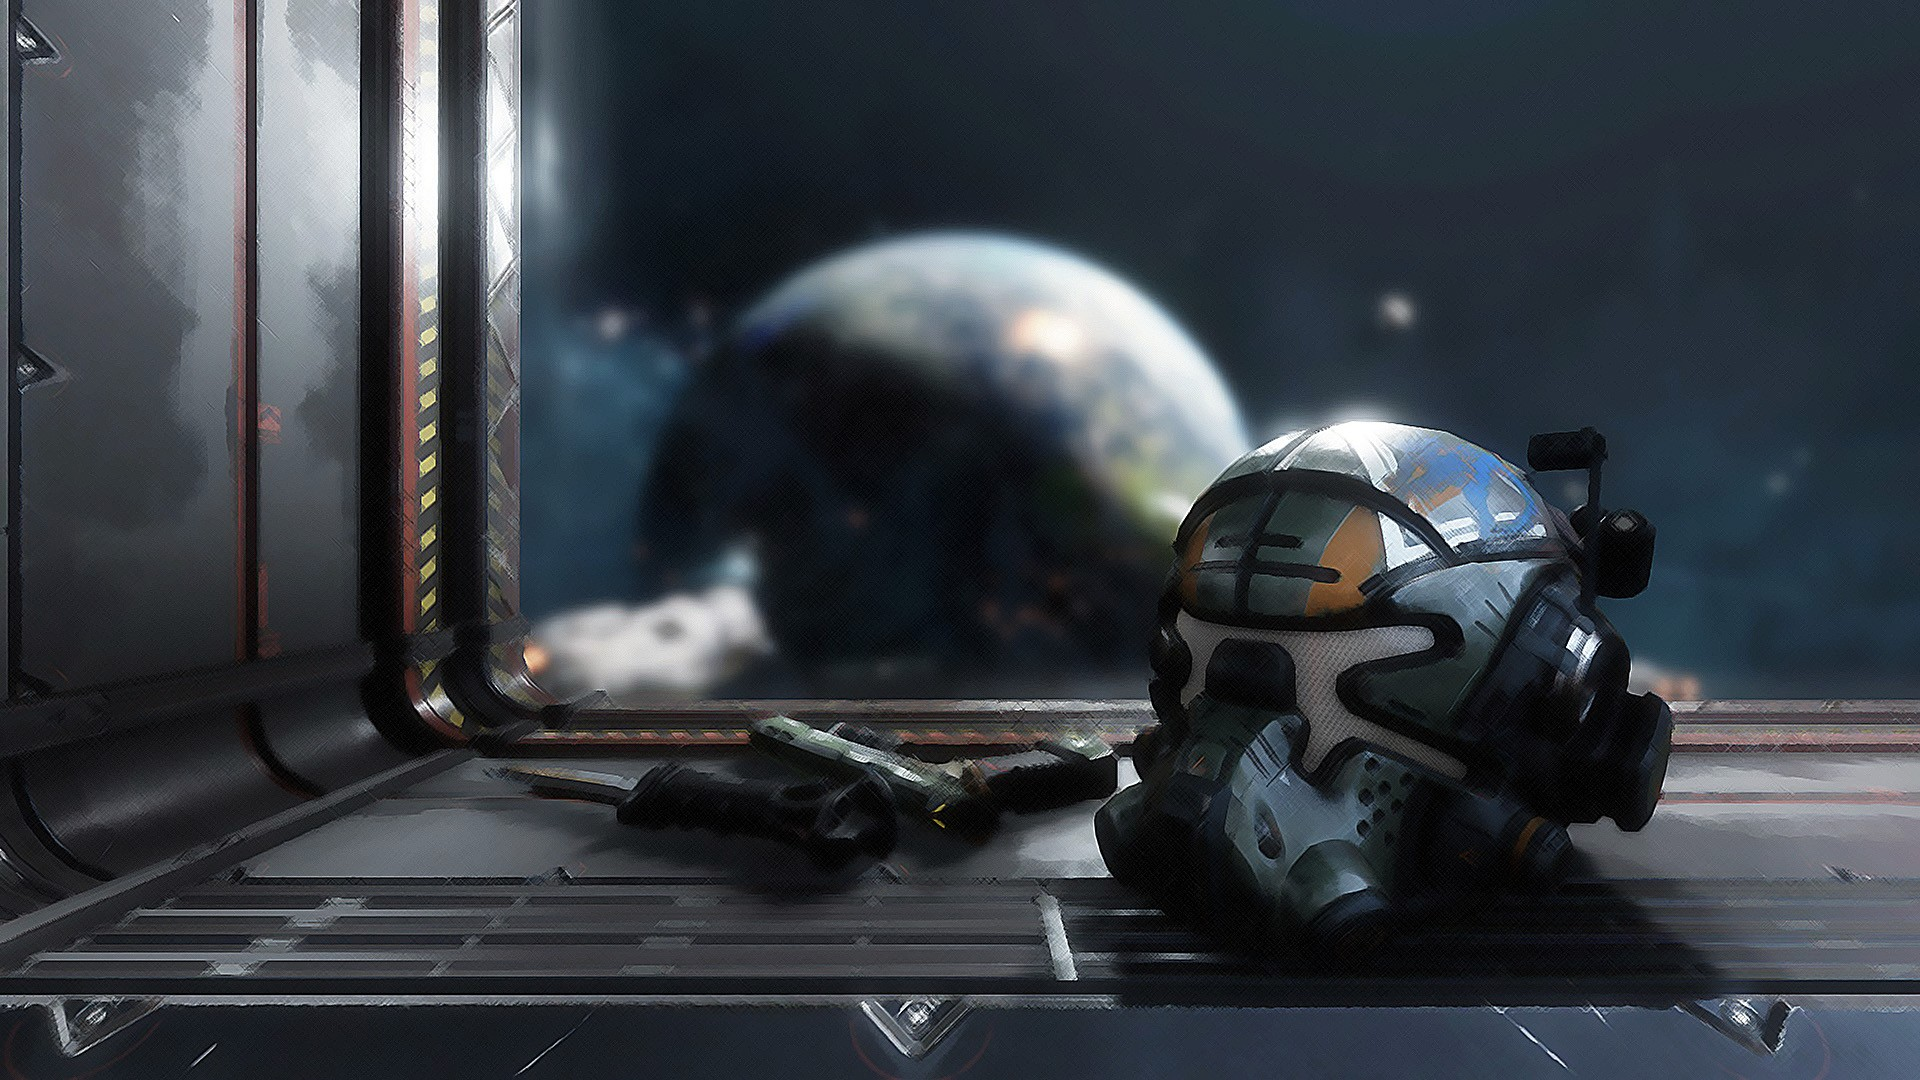 General 1920x1080 Titanfall 2 EA  Respawn Entertainment Titanfall Electronic Arts video games video game art gun helmet PC gaming